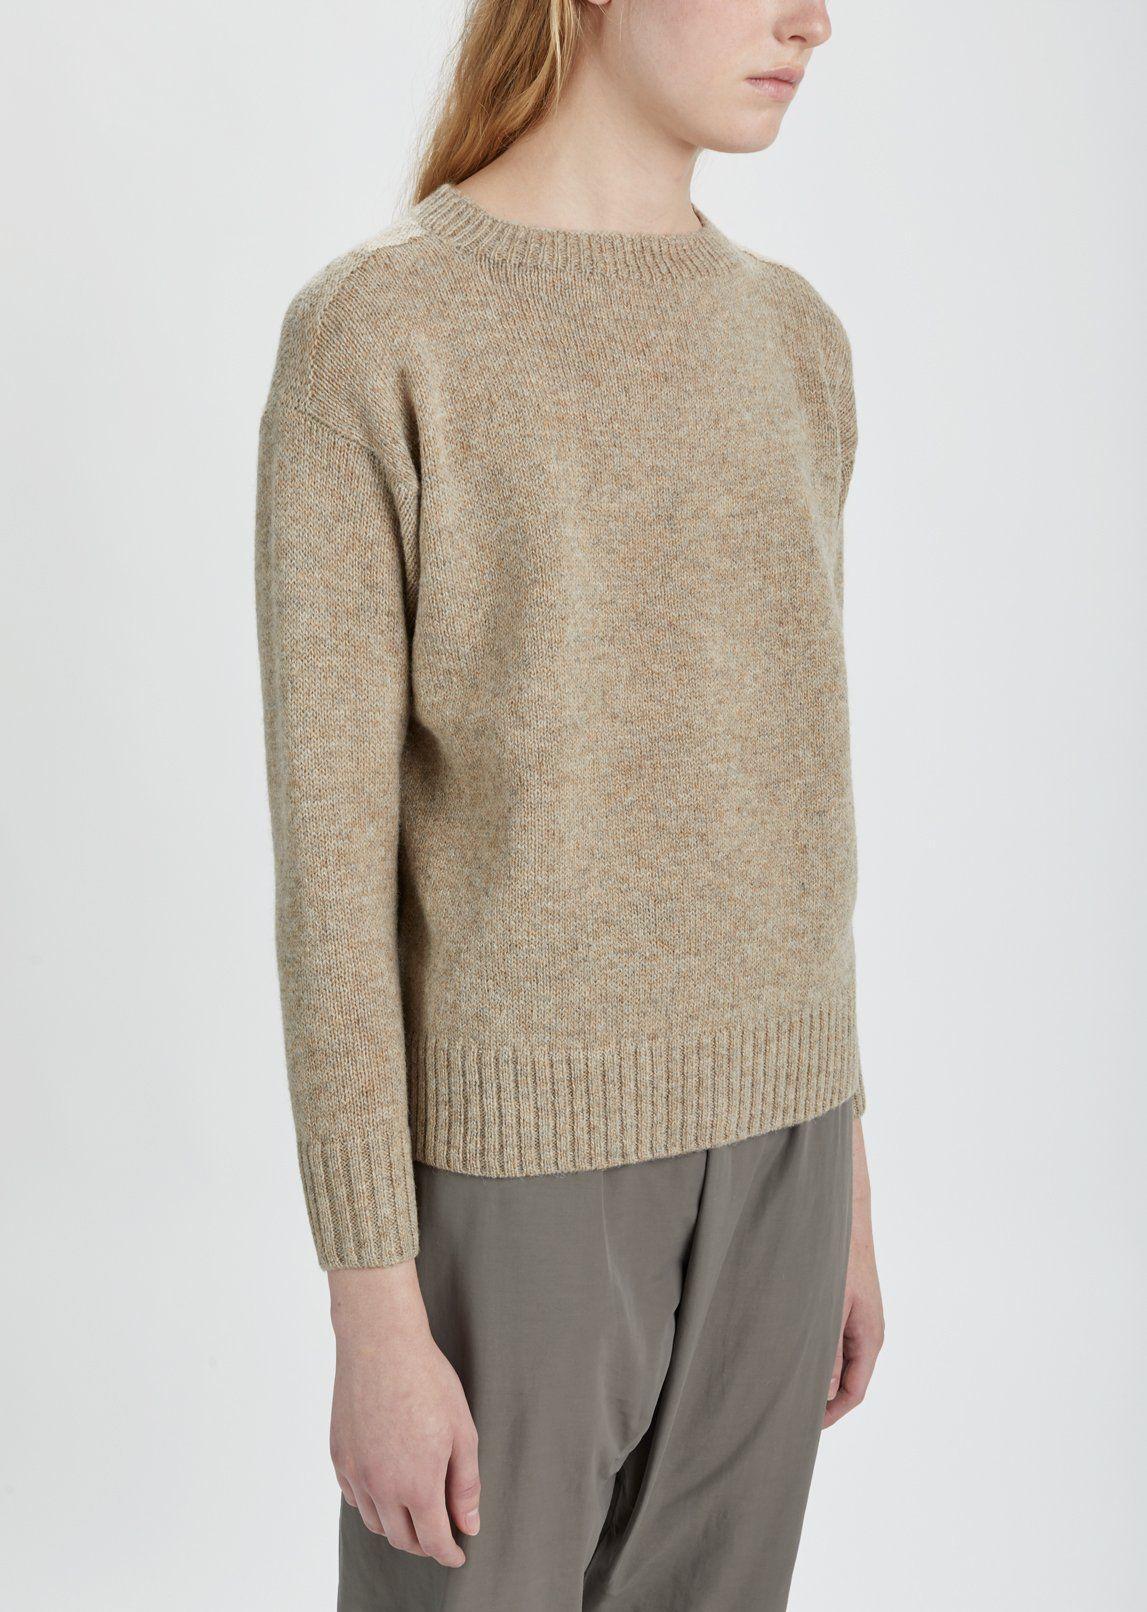 Wunderbar Moderne Pullover Foto Von Sylvia Shetland By La Garçonne